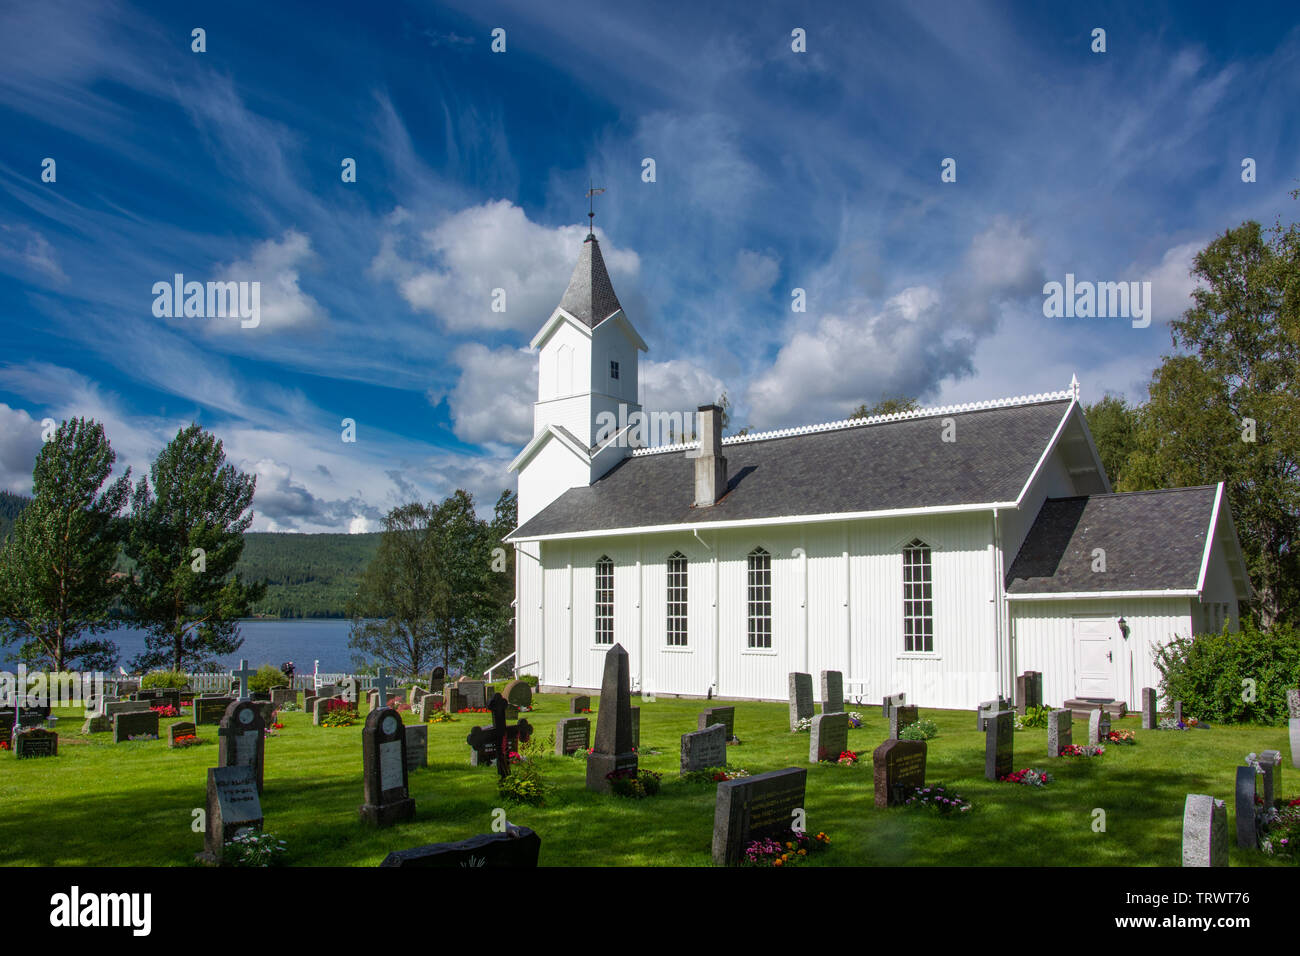 Iglesia en Osensjoen Søre Osen en Noruega / Scandinava Foto de stock